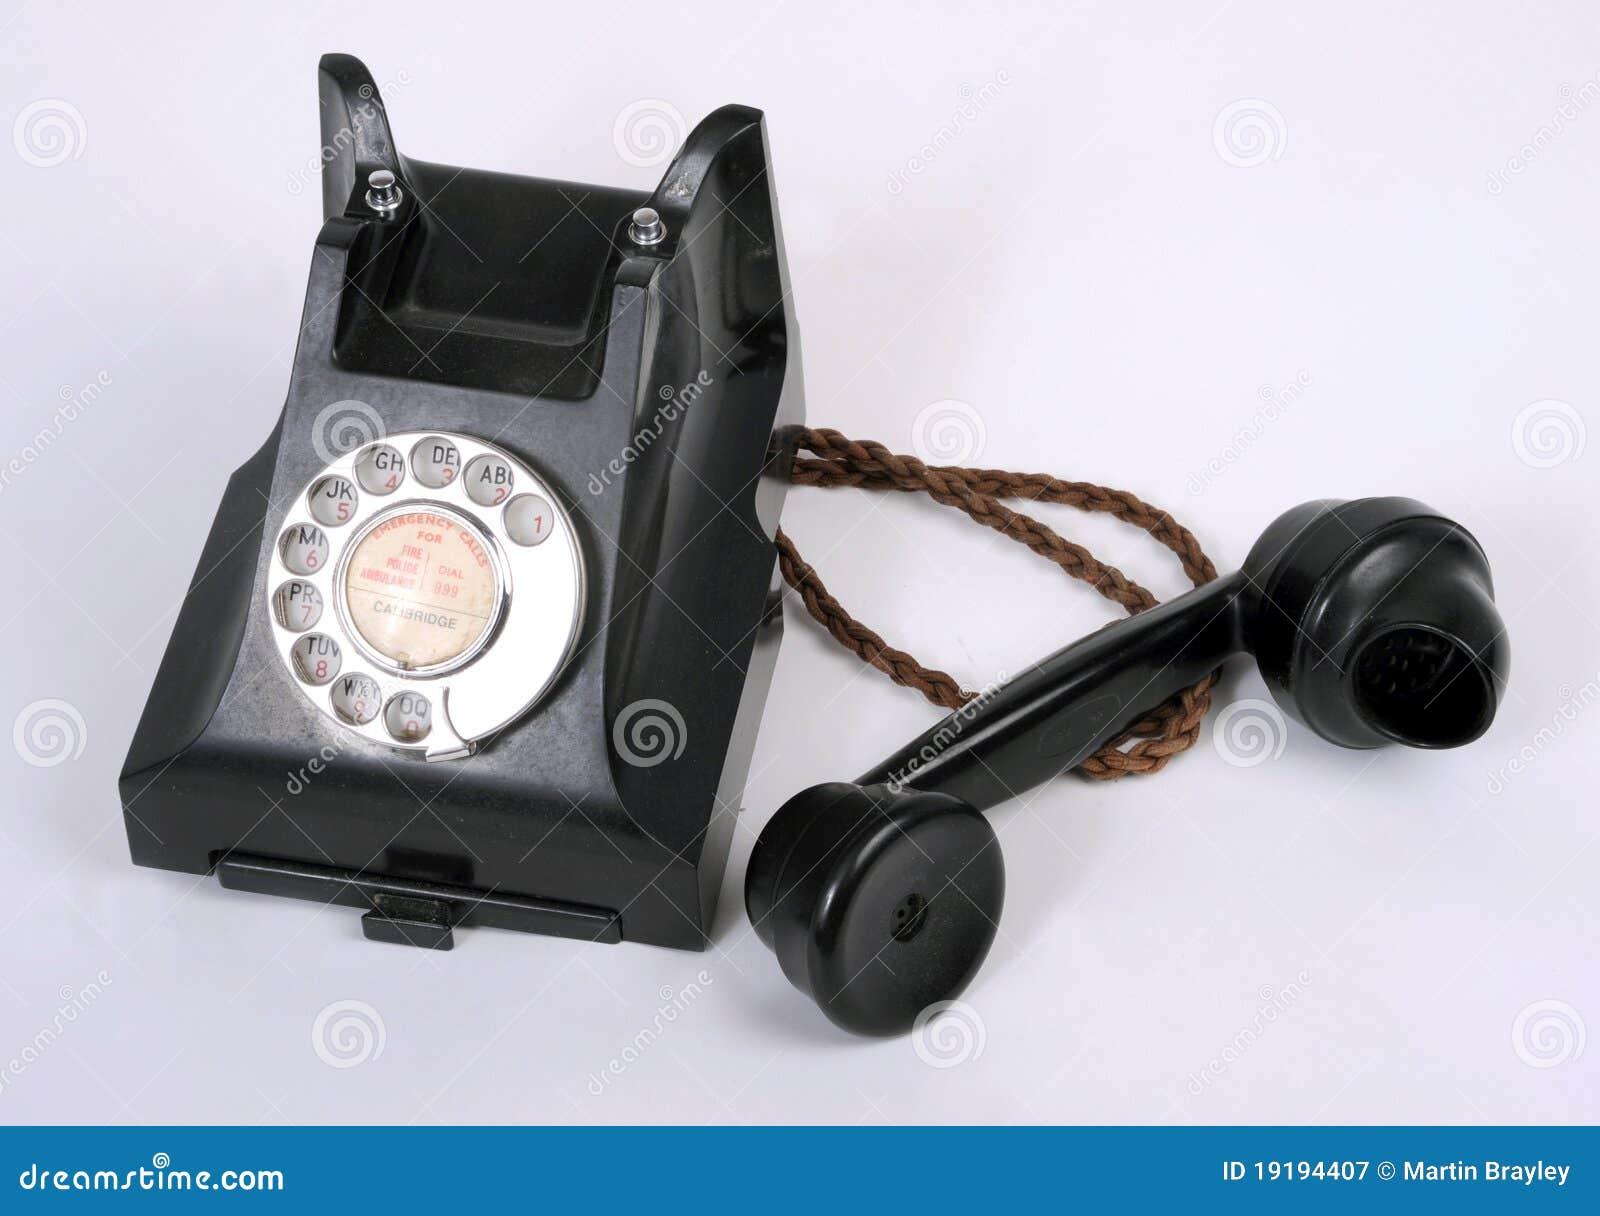 Telephone 1950 1940-1950 Telephone